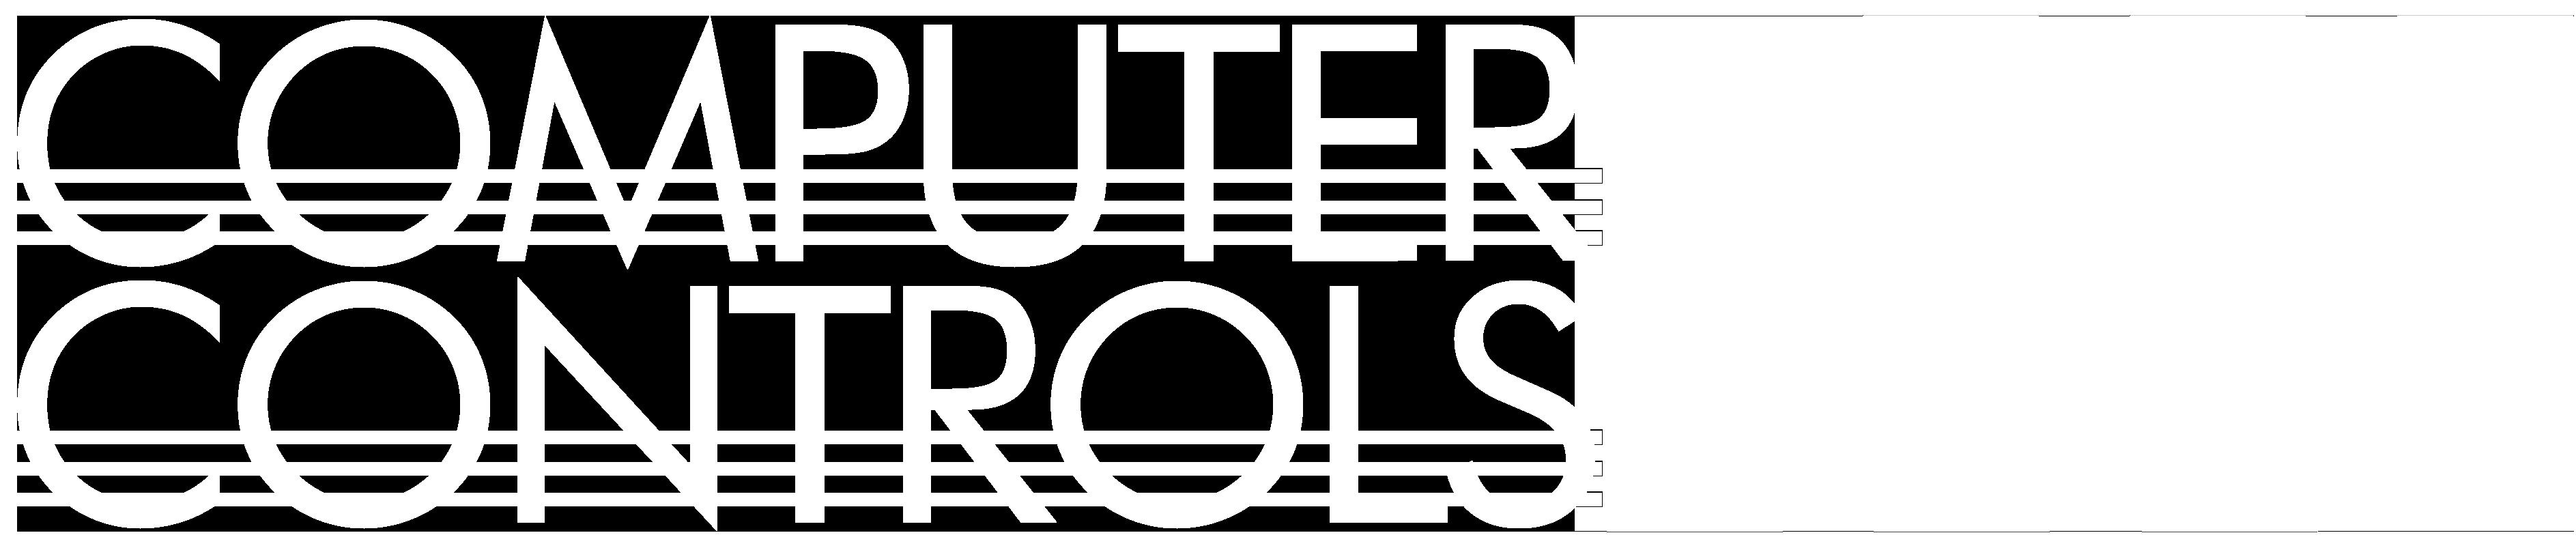 CControls (Computer Controls) Logo - White